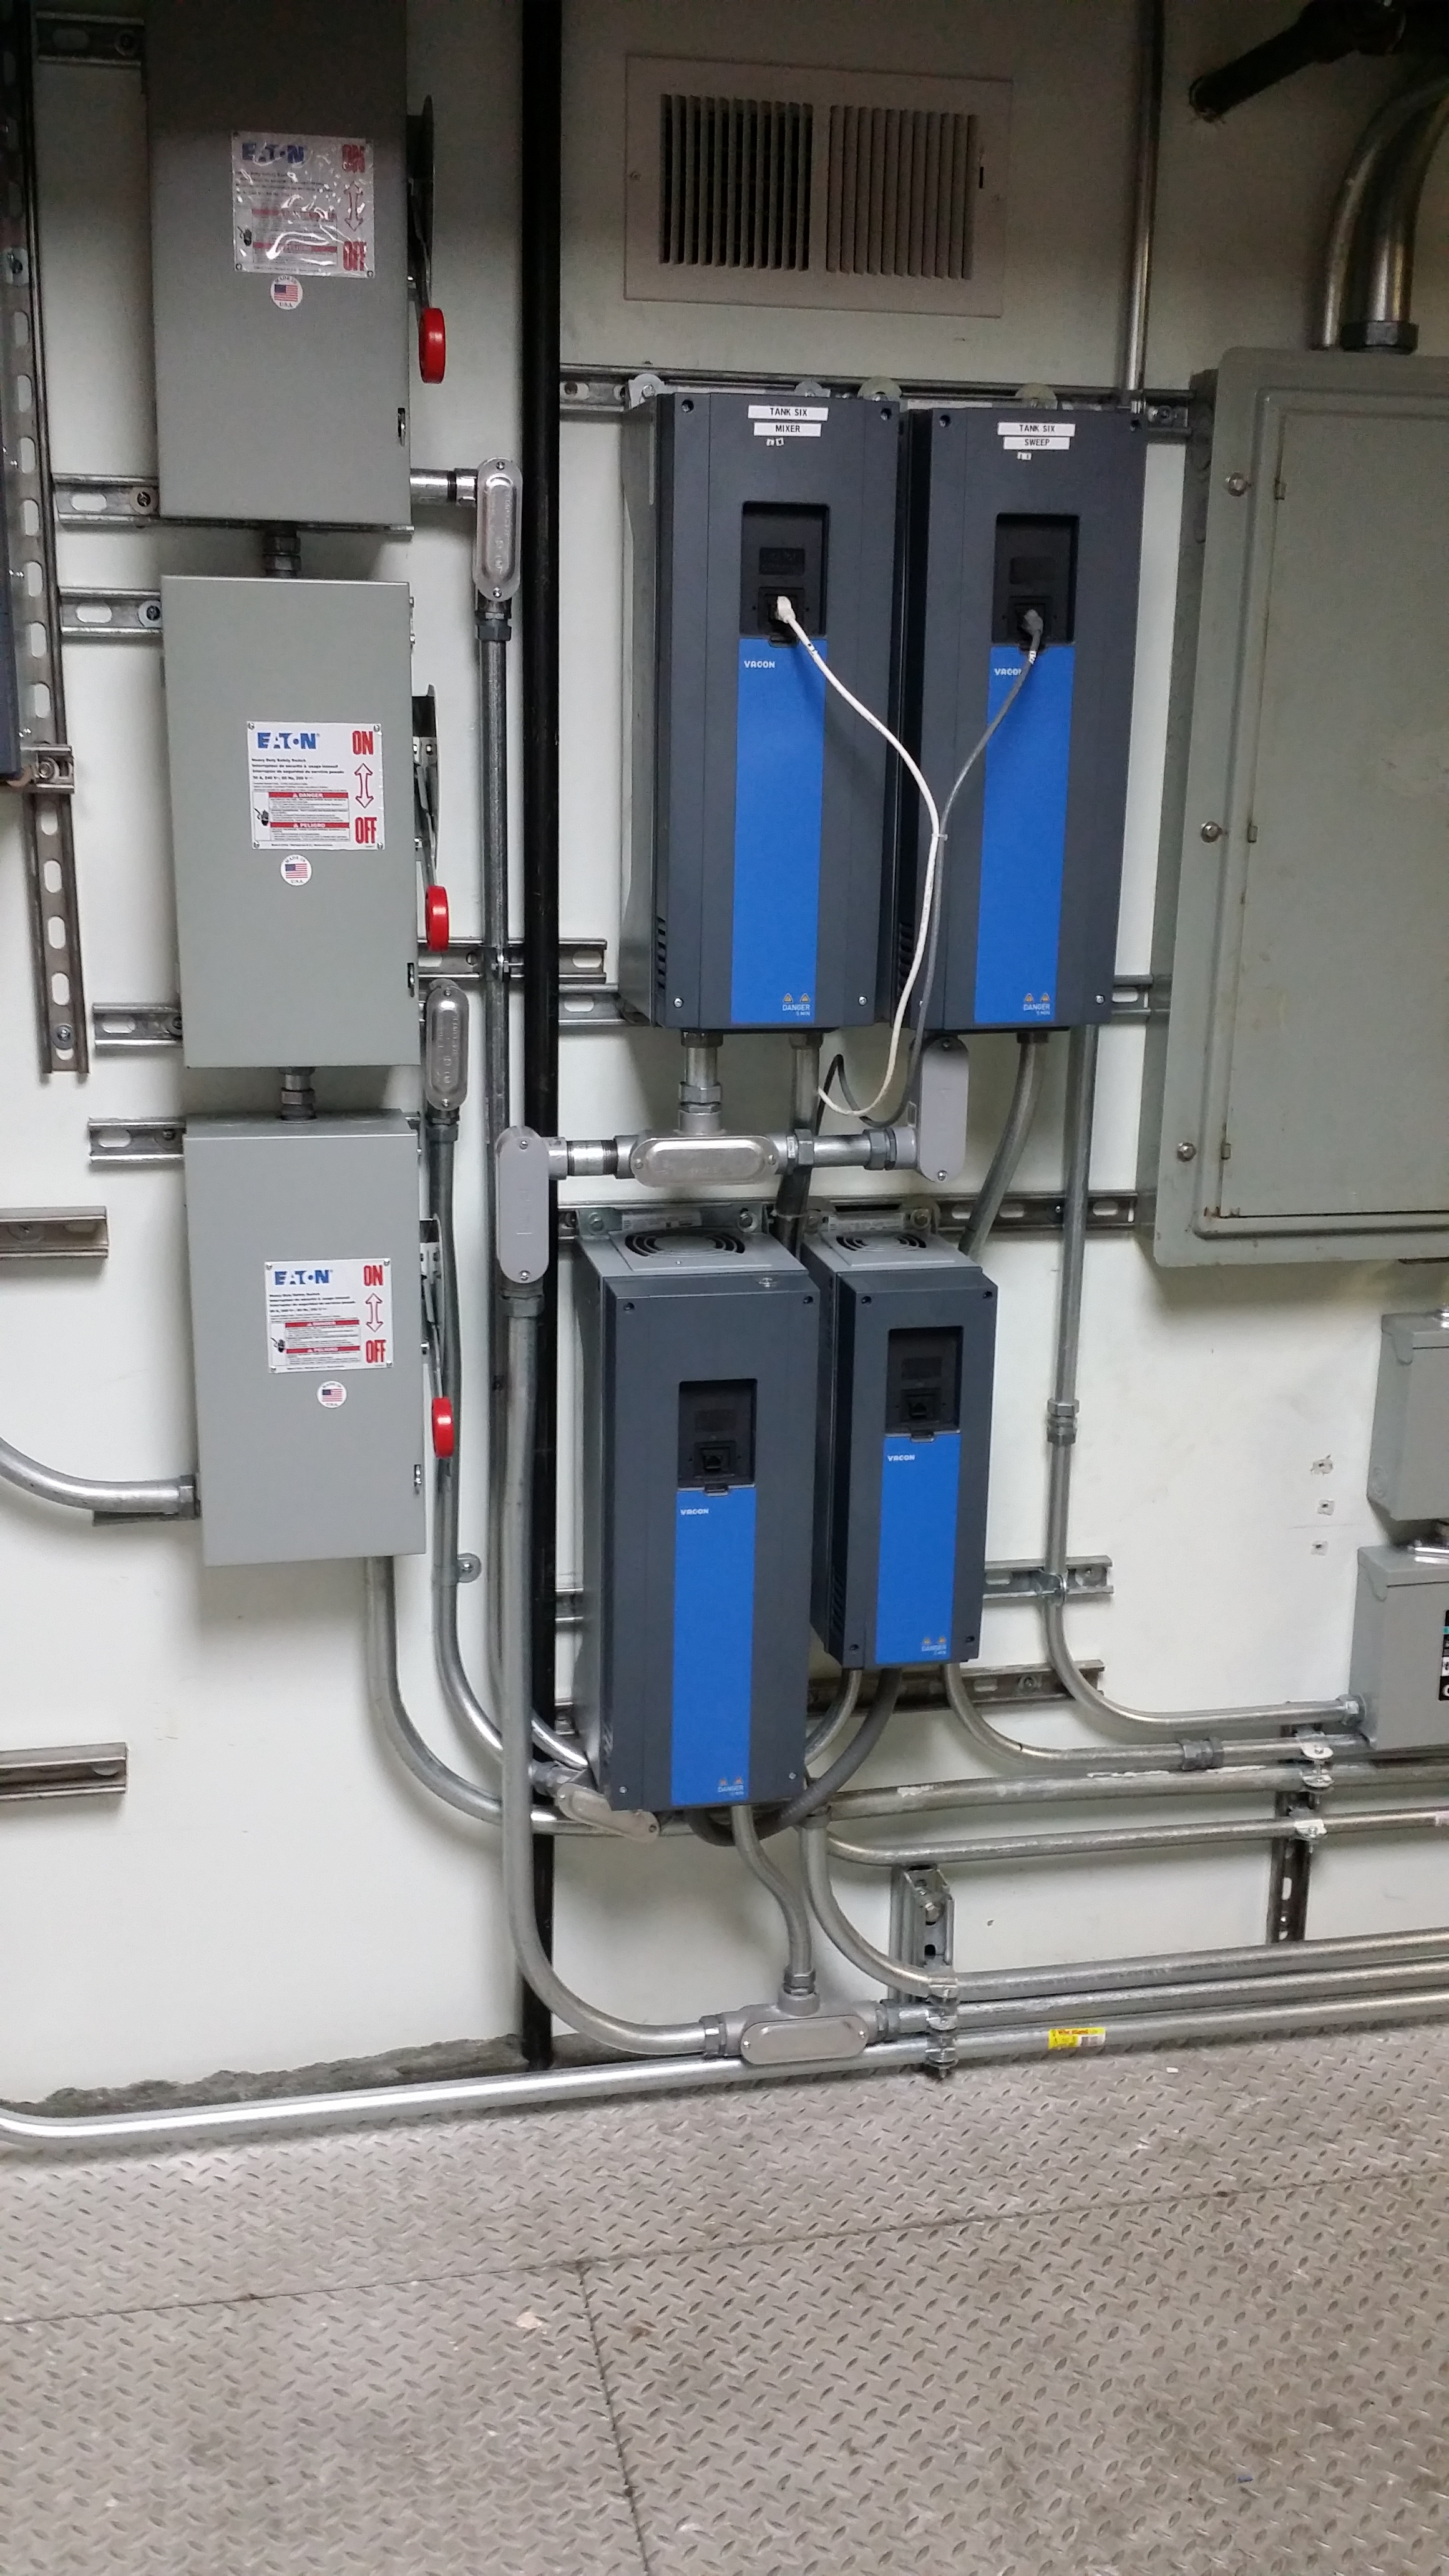 Schematic Industrial Electric Llc In Bakersfield Ca 93301